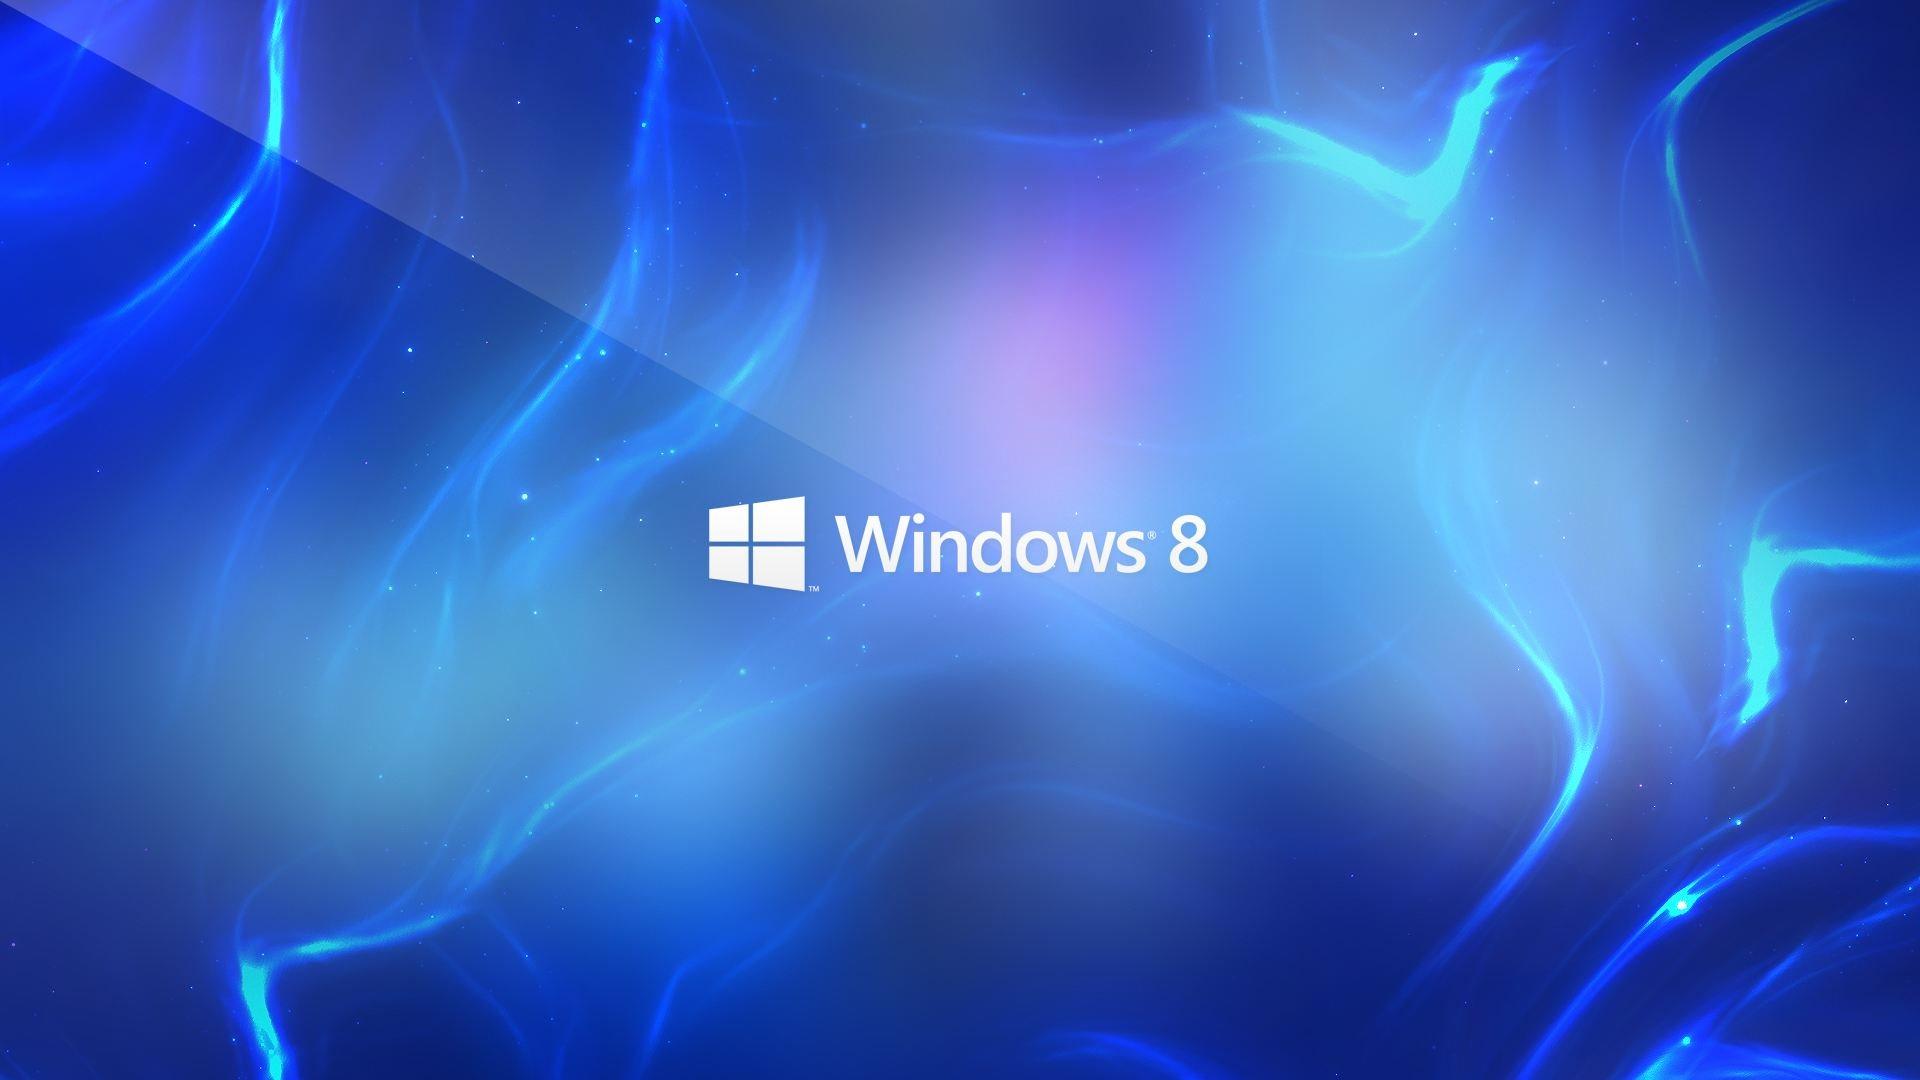 windows 8 widescreen hd wallpapers Desktop Backgrounds for HD 1920x1080